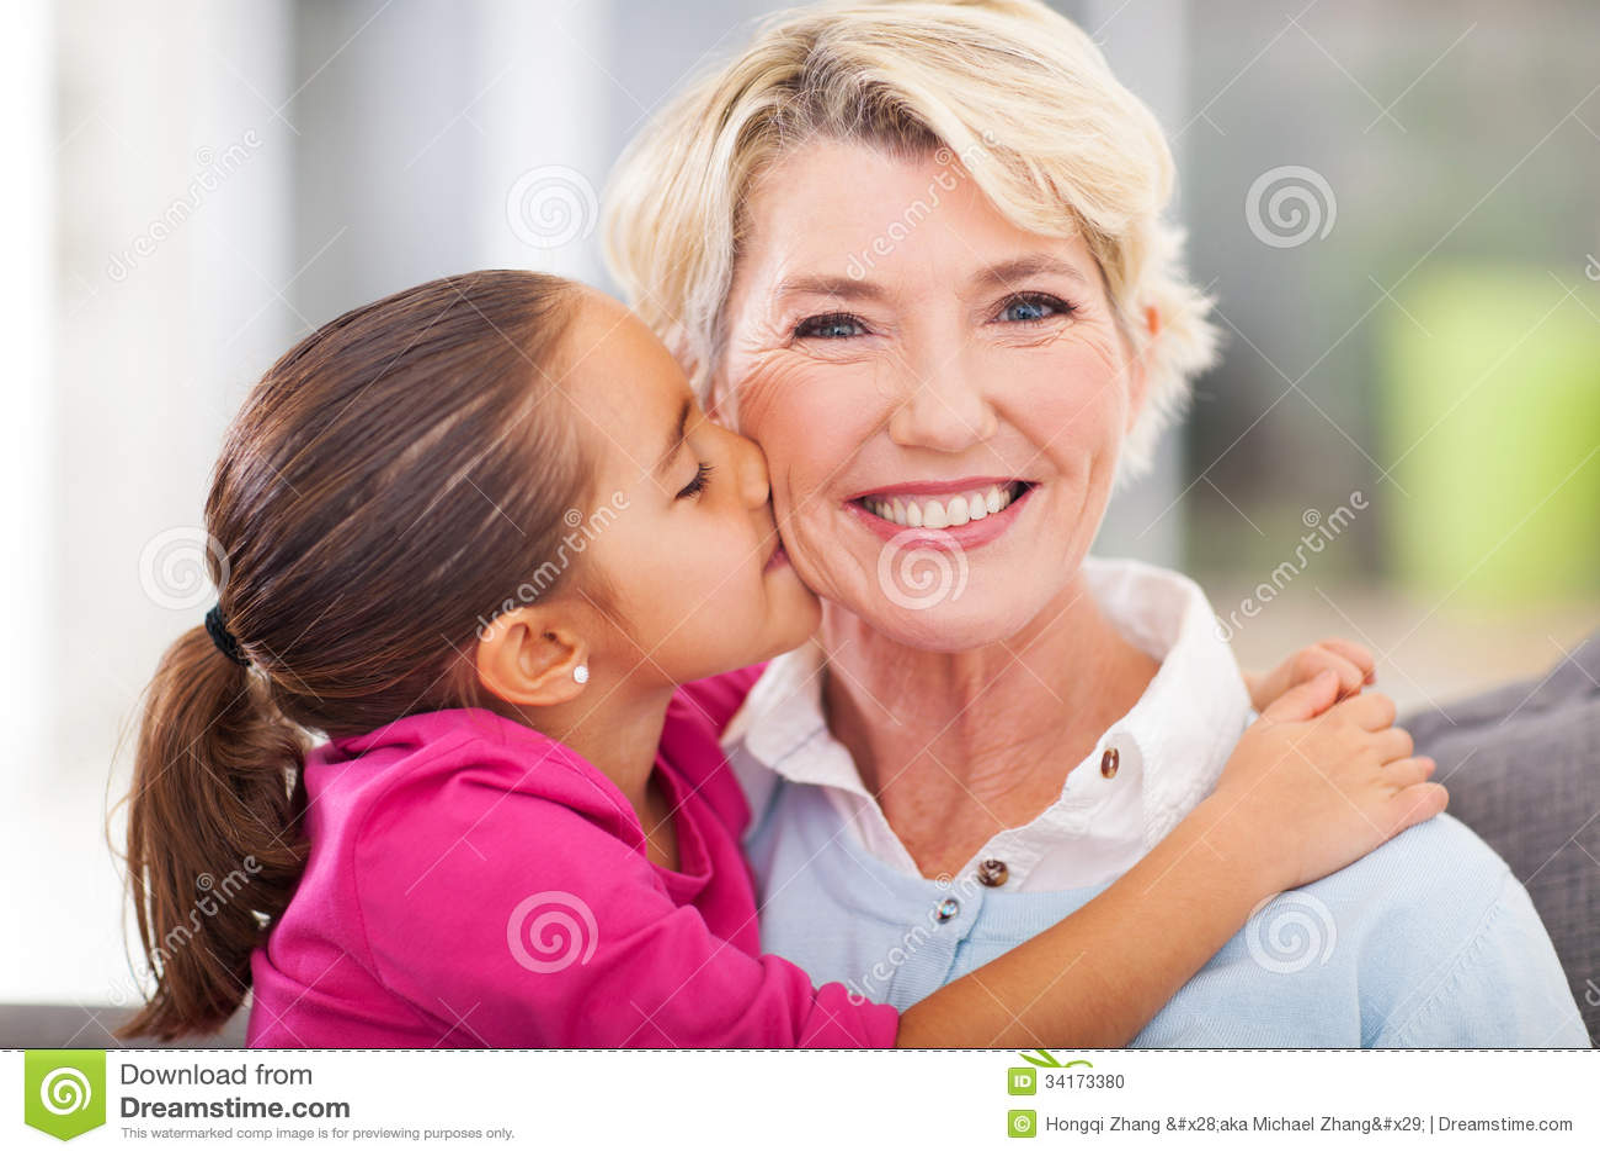 Petite-fille embrassant la grand-mère